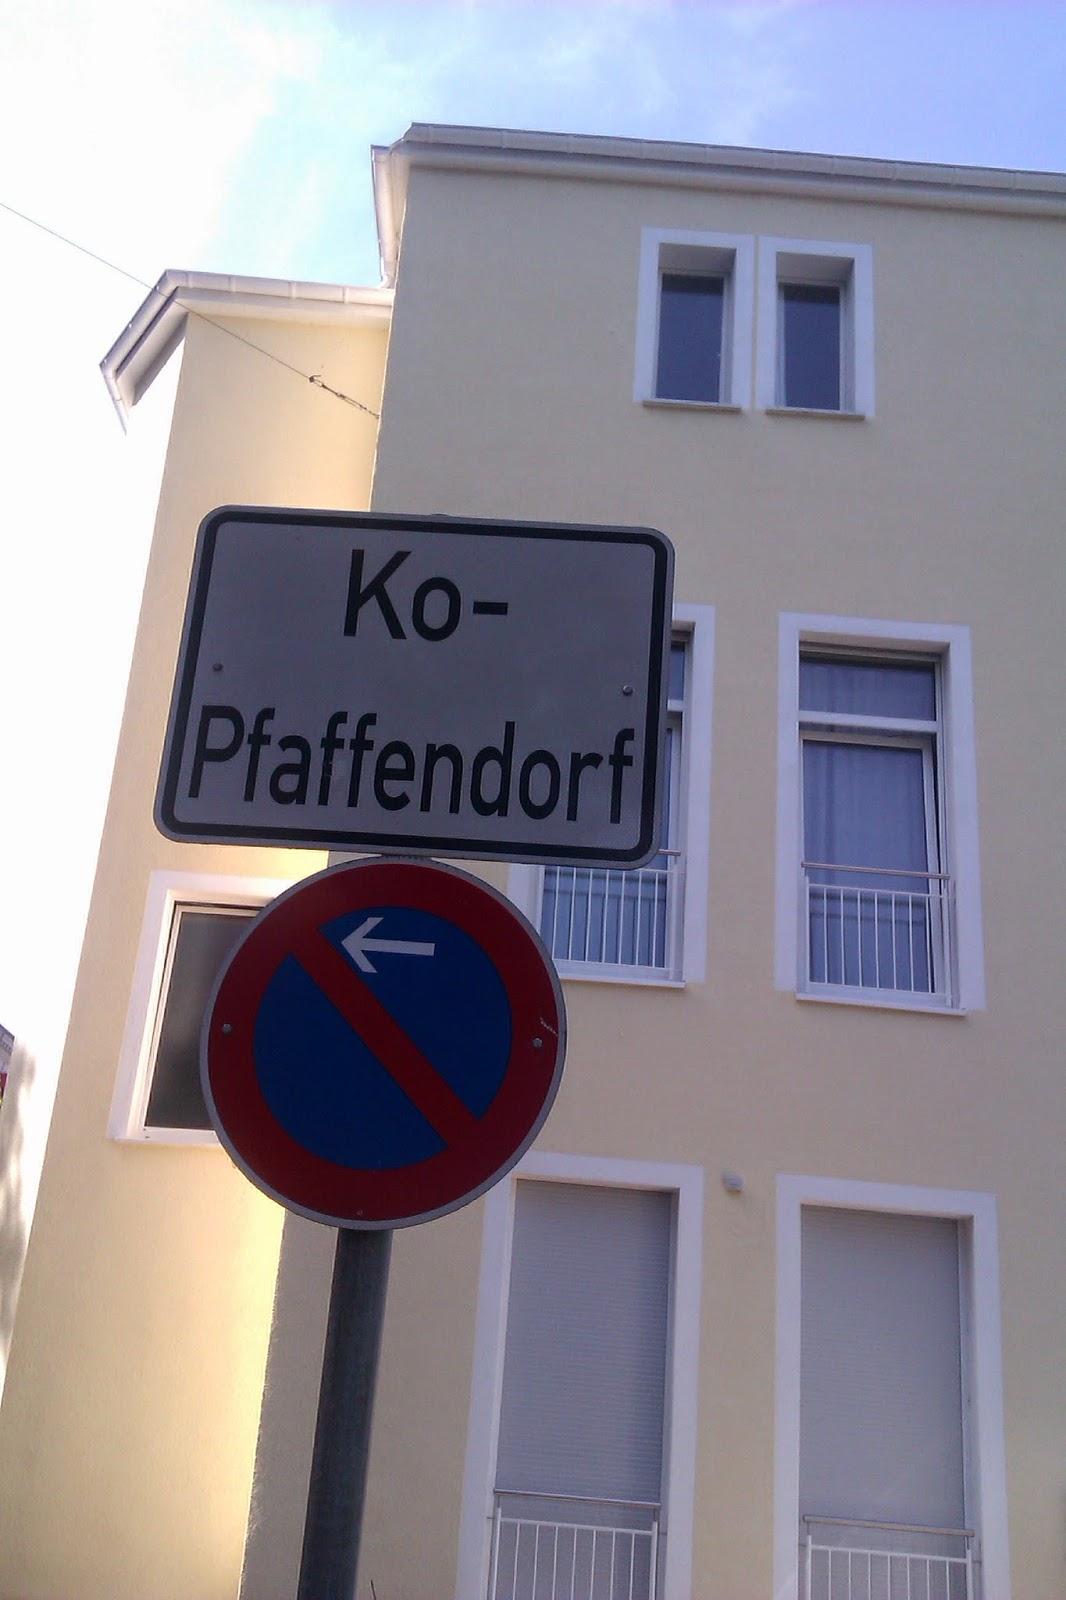 KO-Pfaffeldorf Rhein